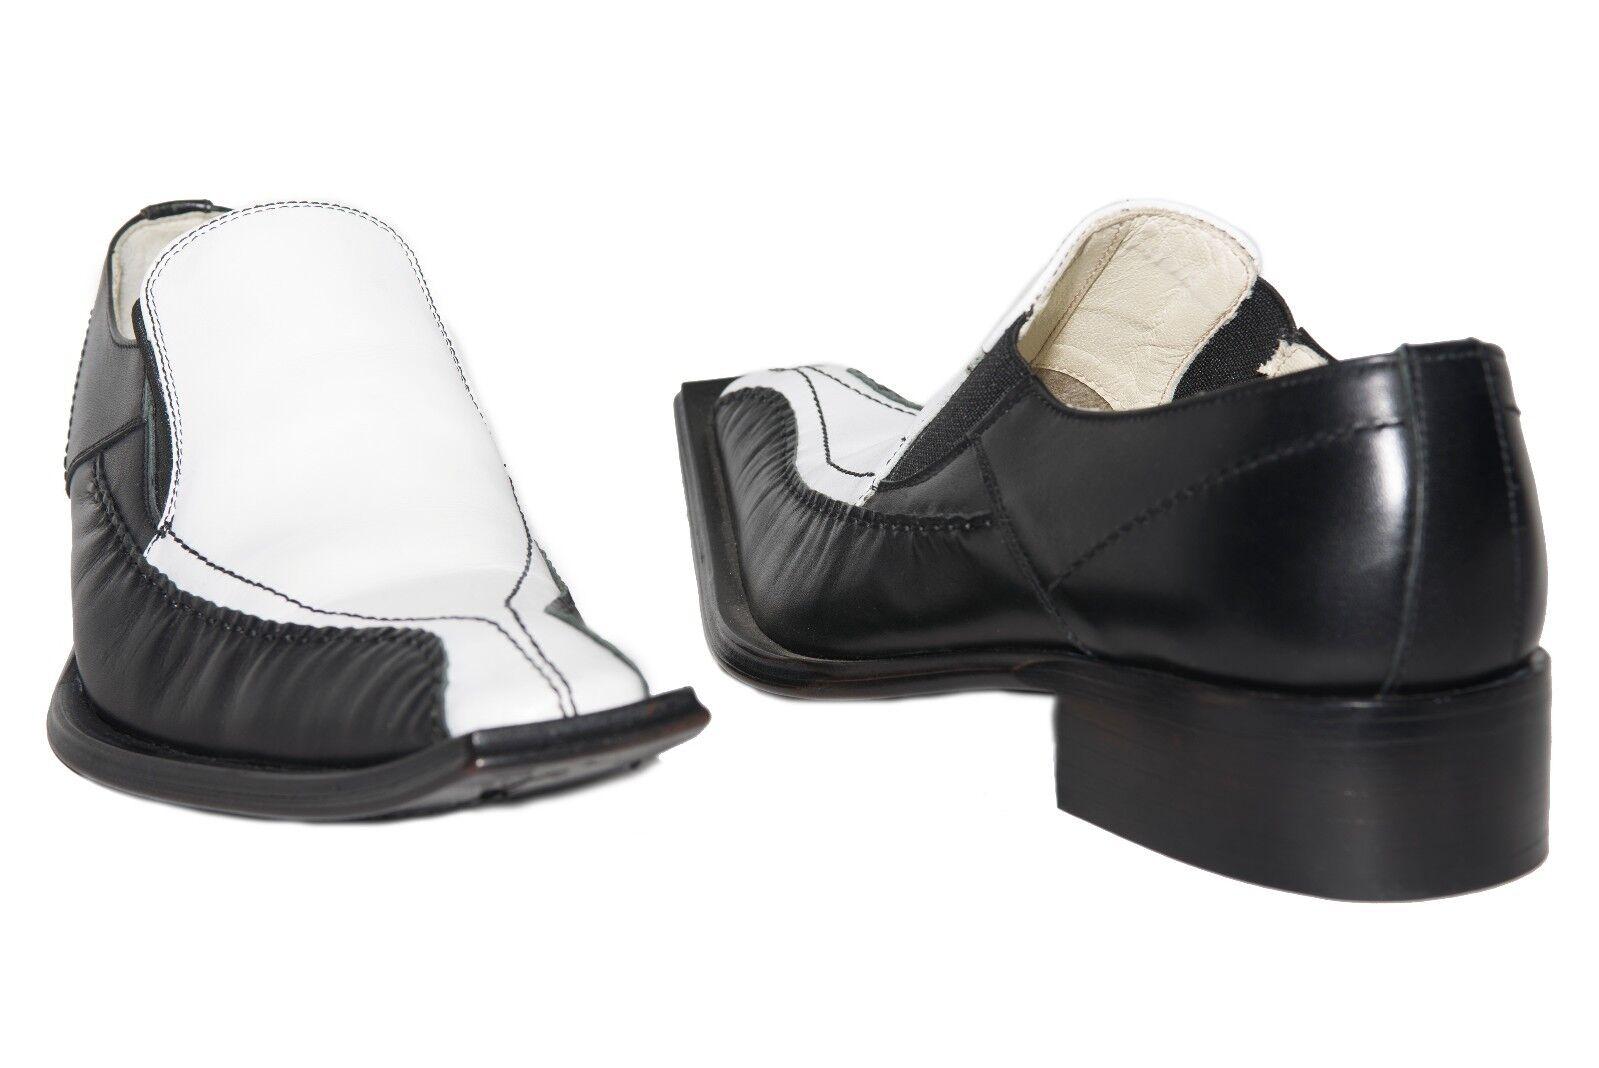 Venti M -388 Made in Spain nero   bianca leather slip on scarpe  varie dimensioni